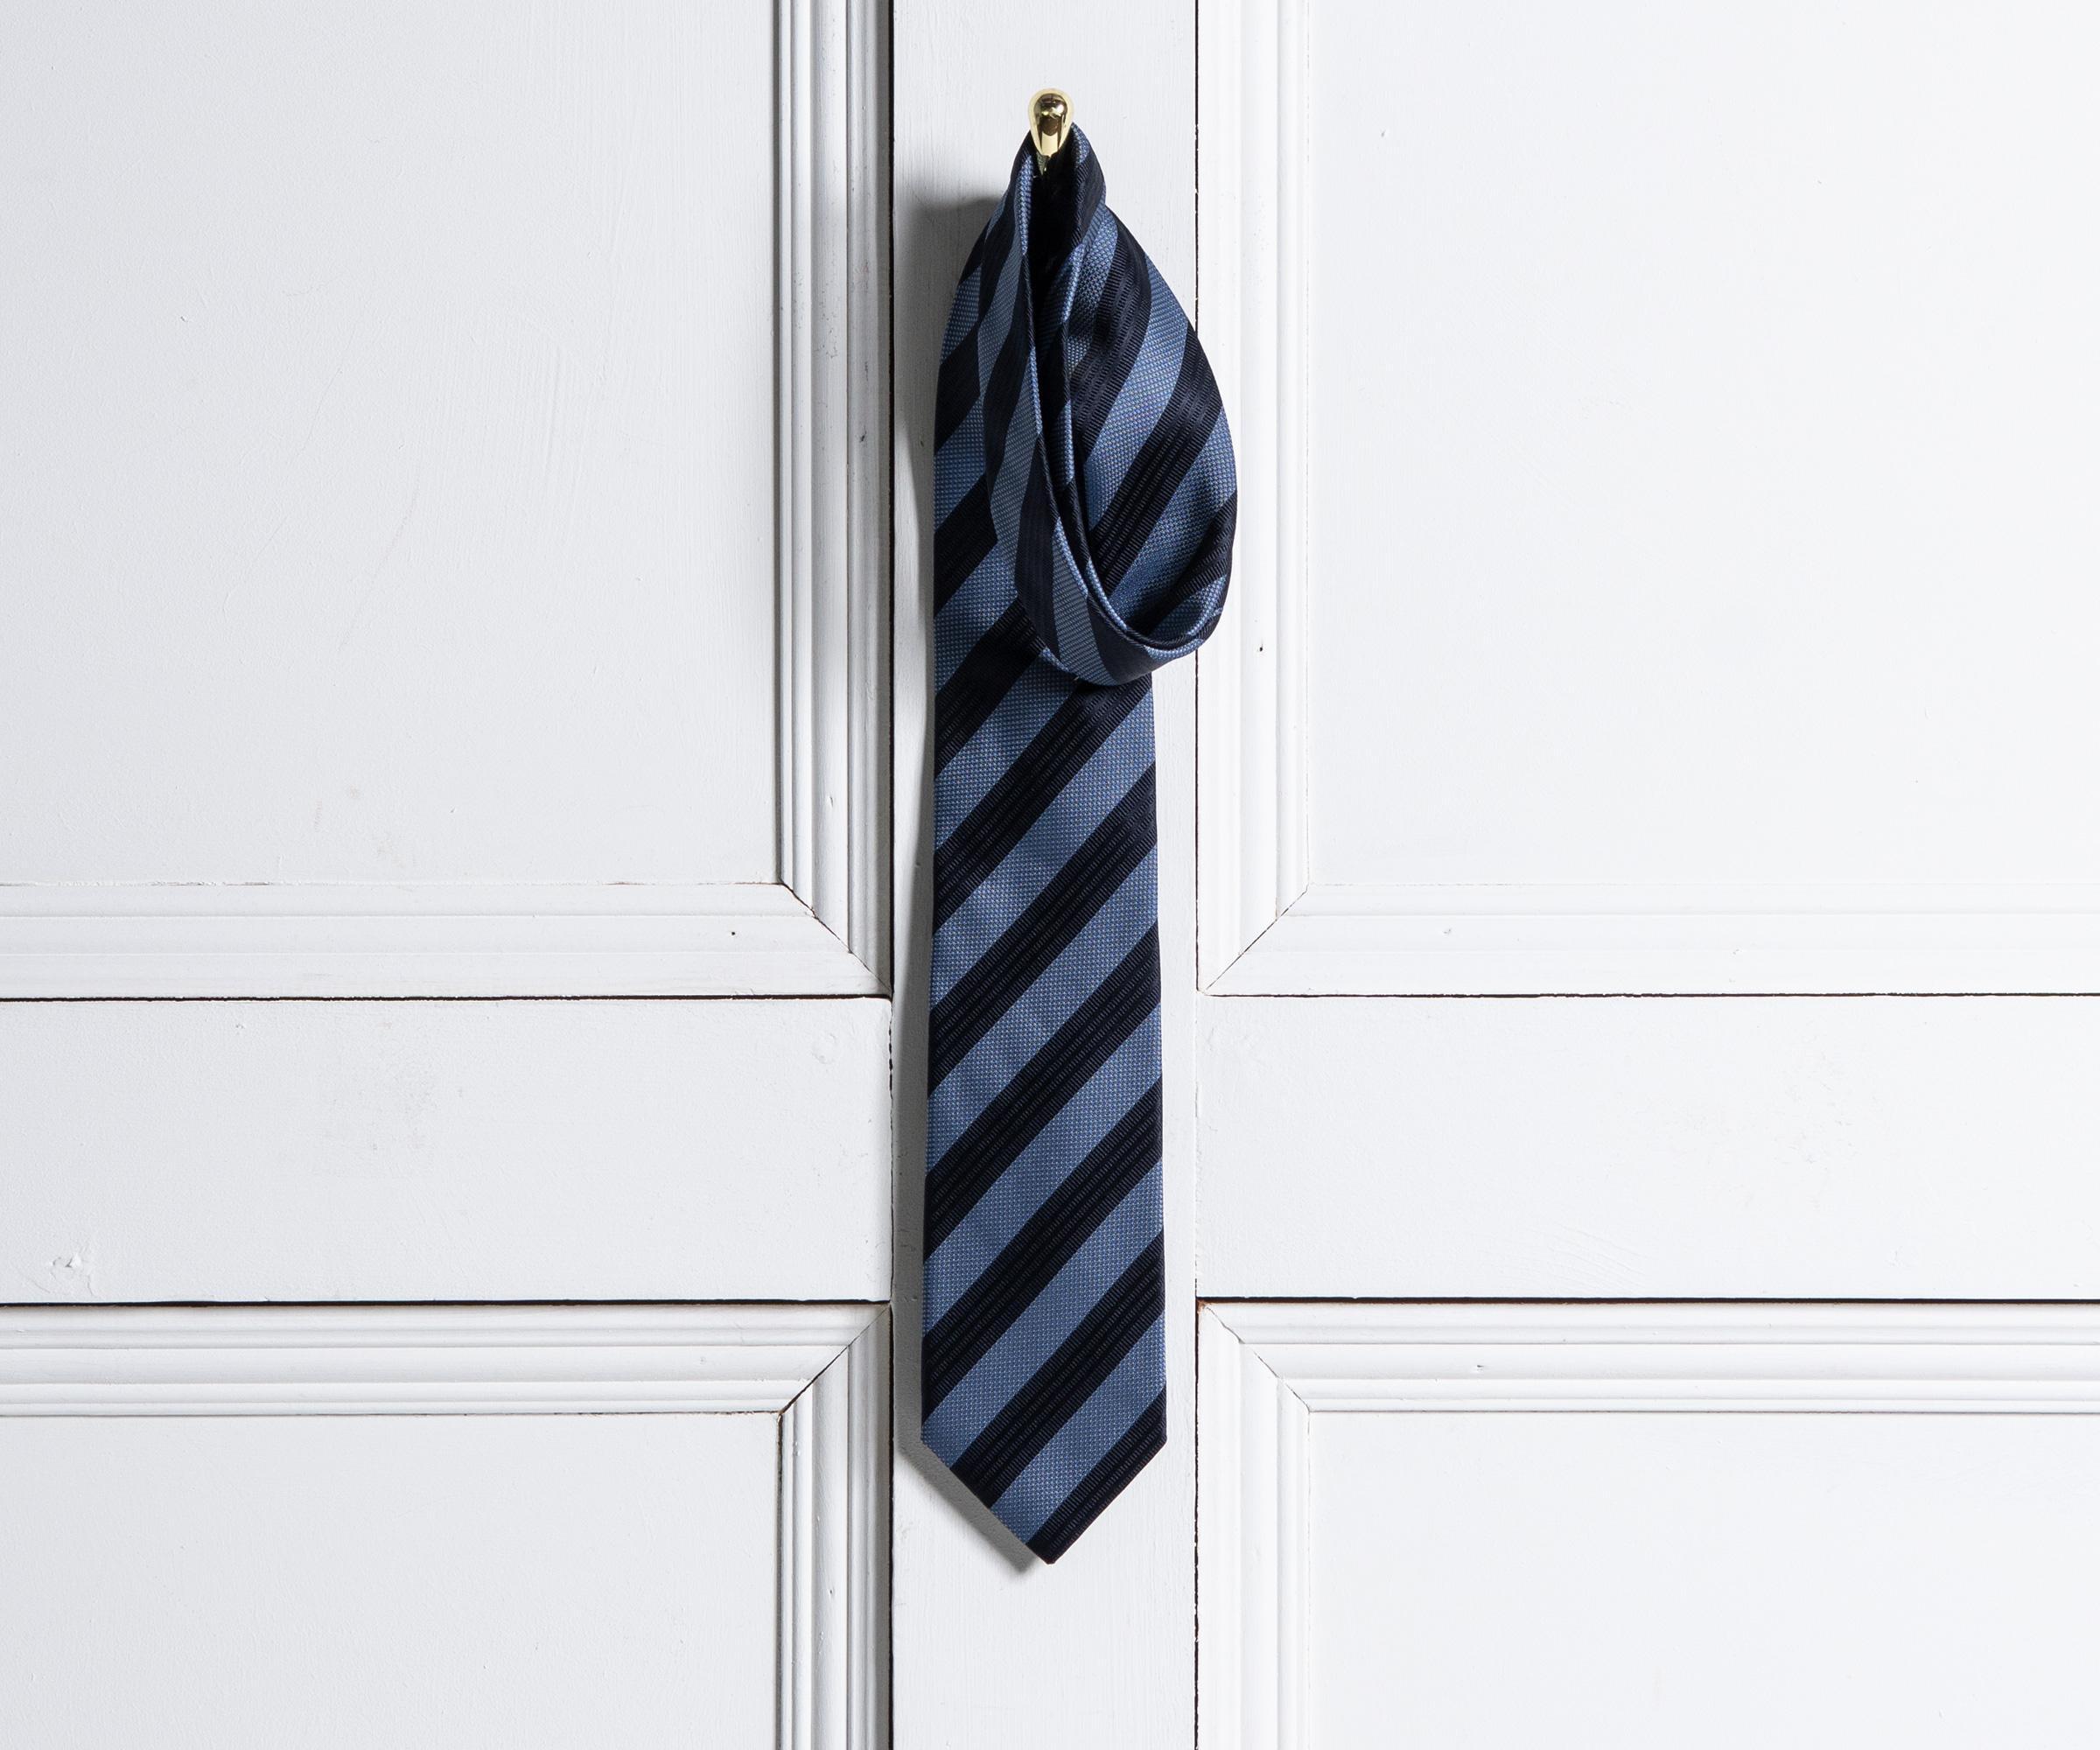 4b554c281078e Lyst - BOSS Textured Club Stripe Silk Tie Blue in Blue for Men